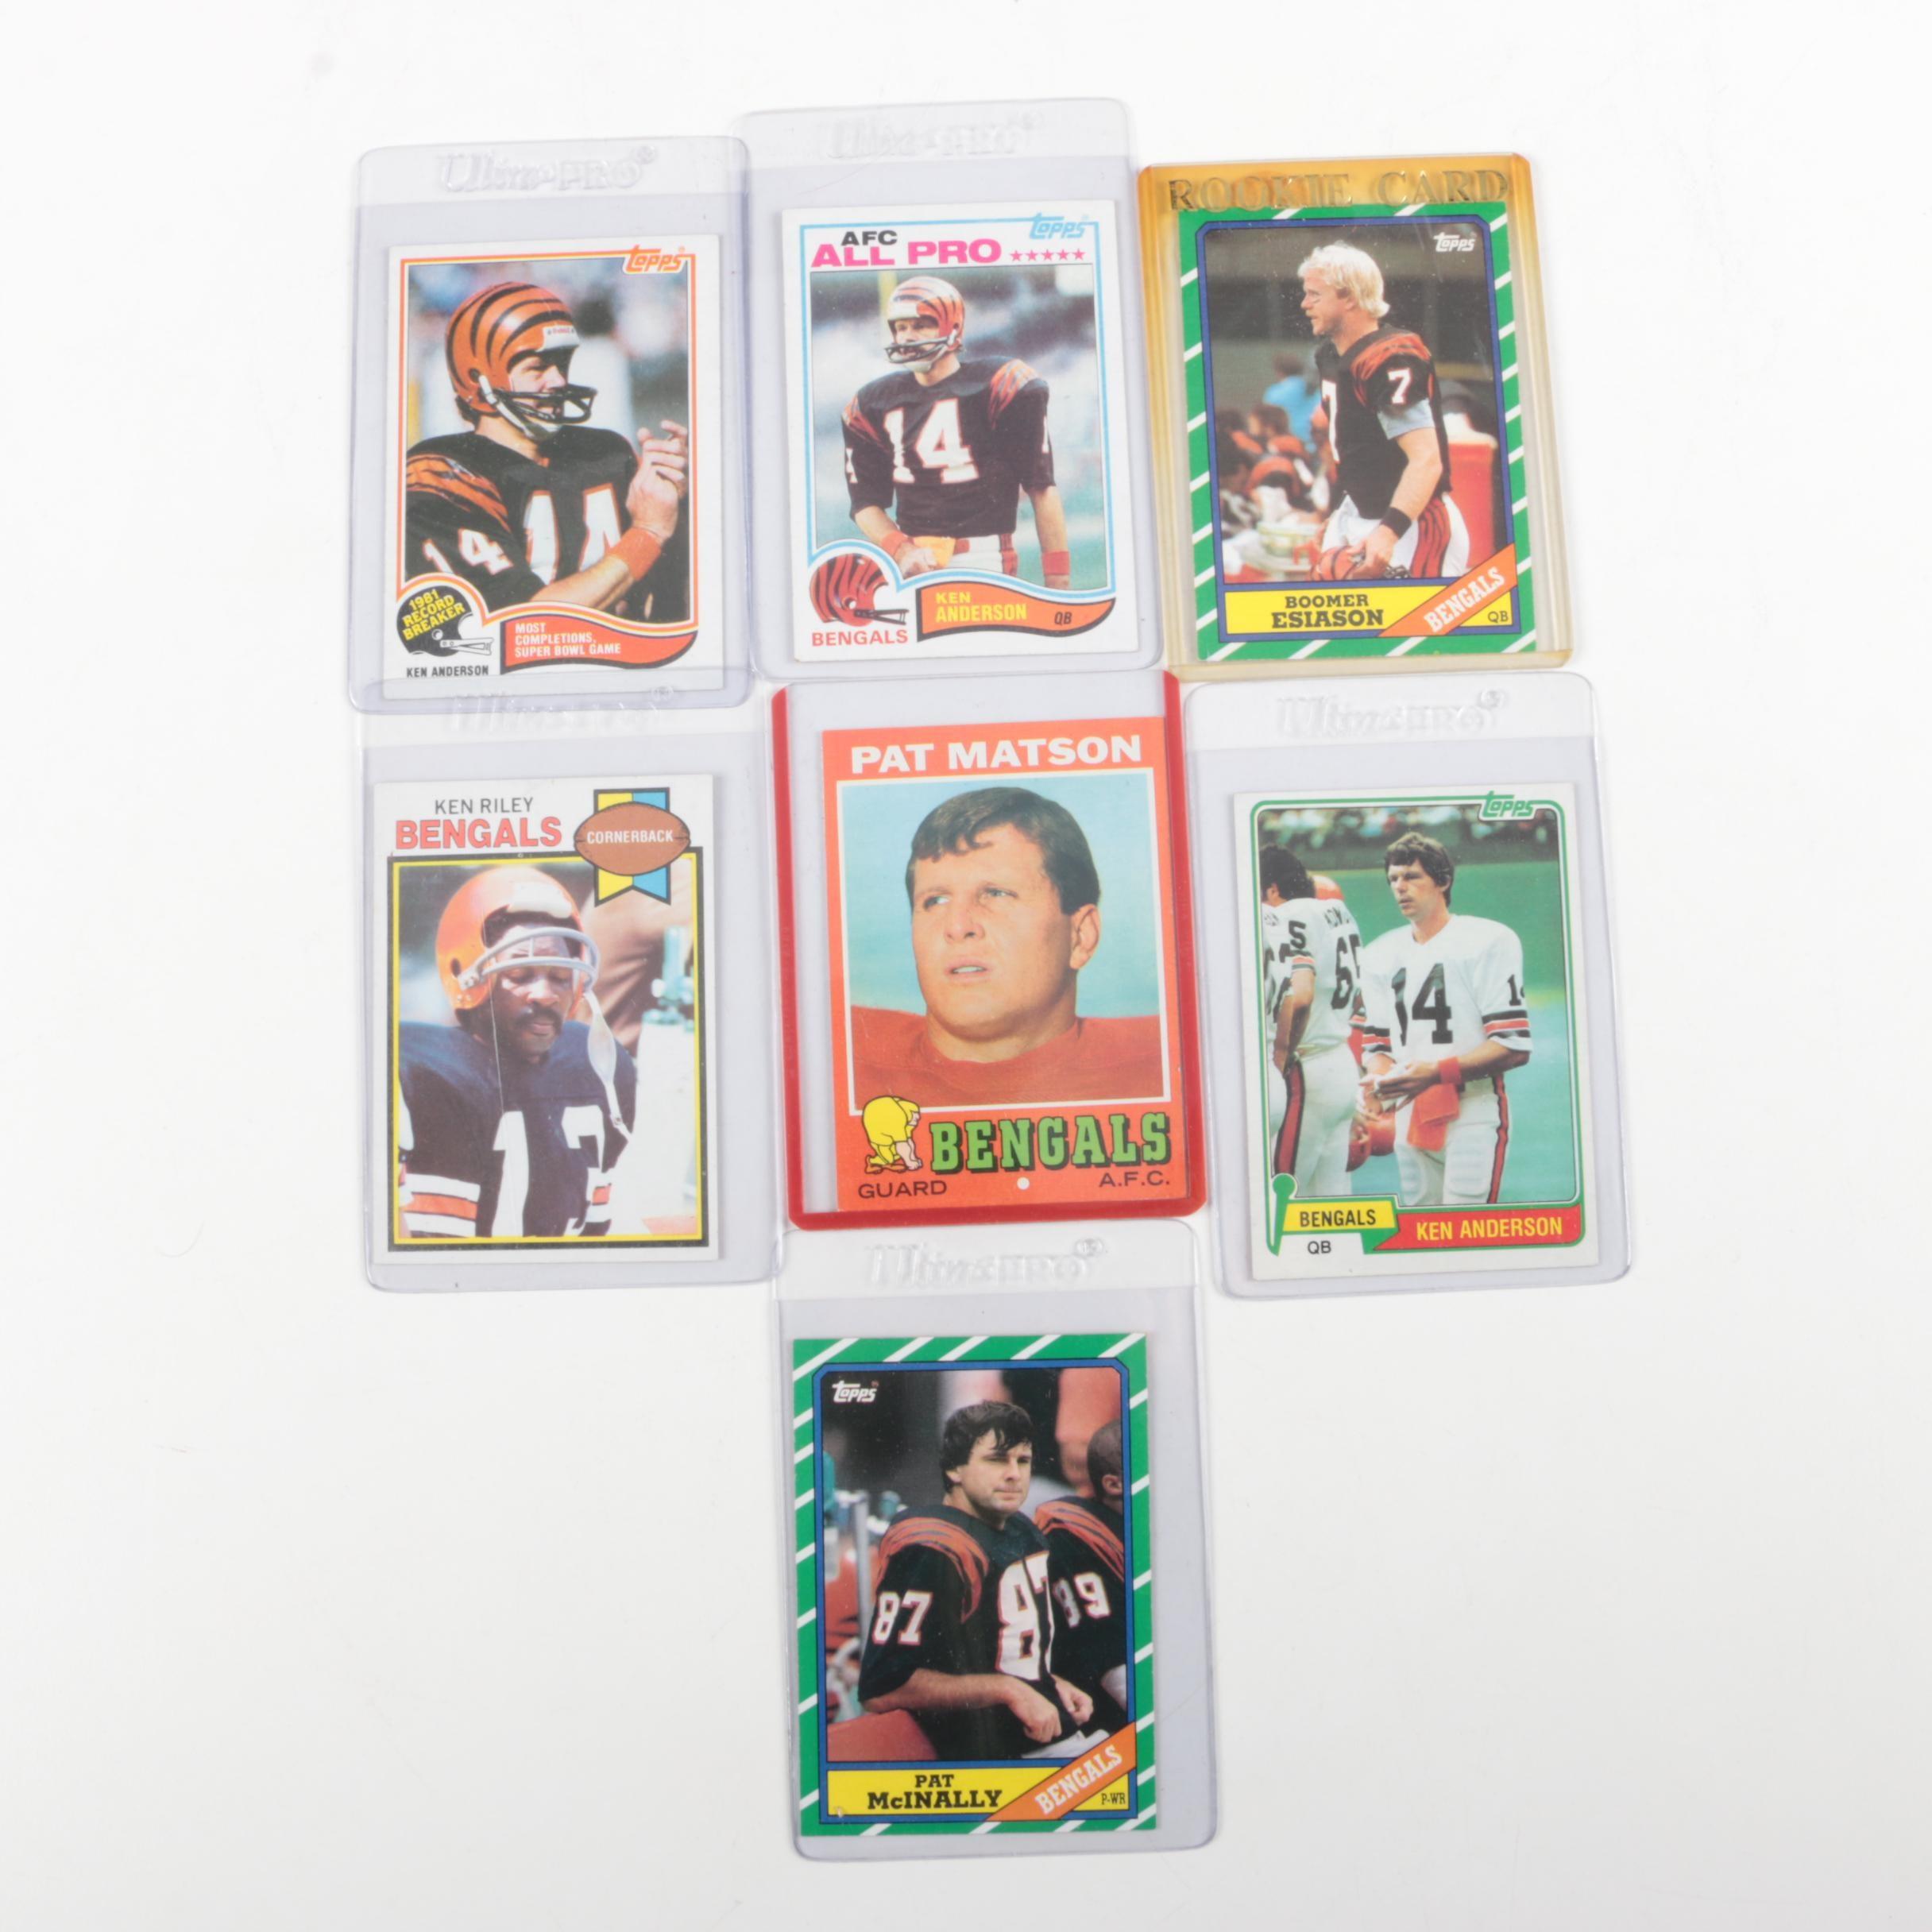 Assorted Topps Football Cards featuring Cincinnati Bengals Players